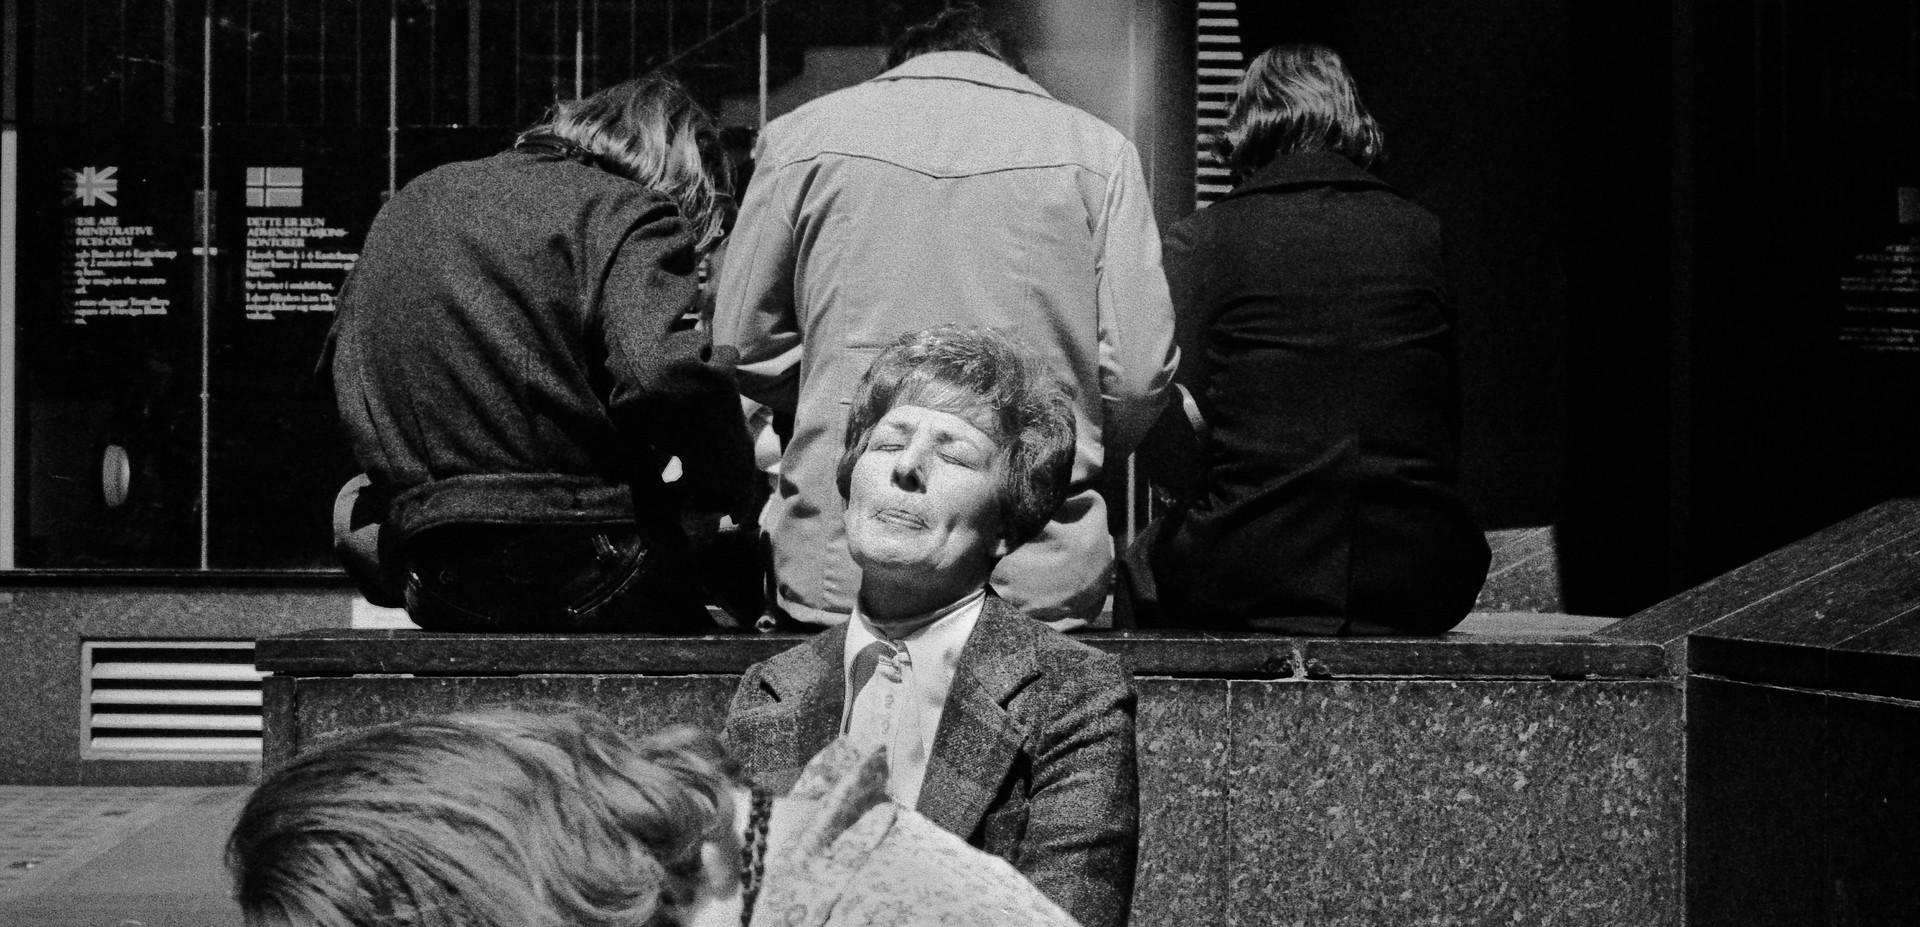 London, England 1982